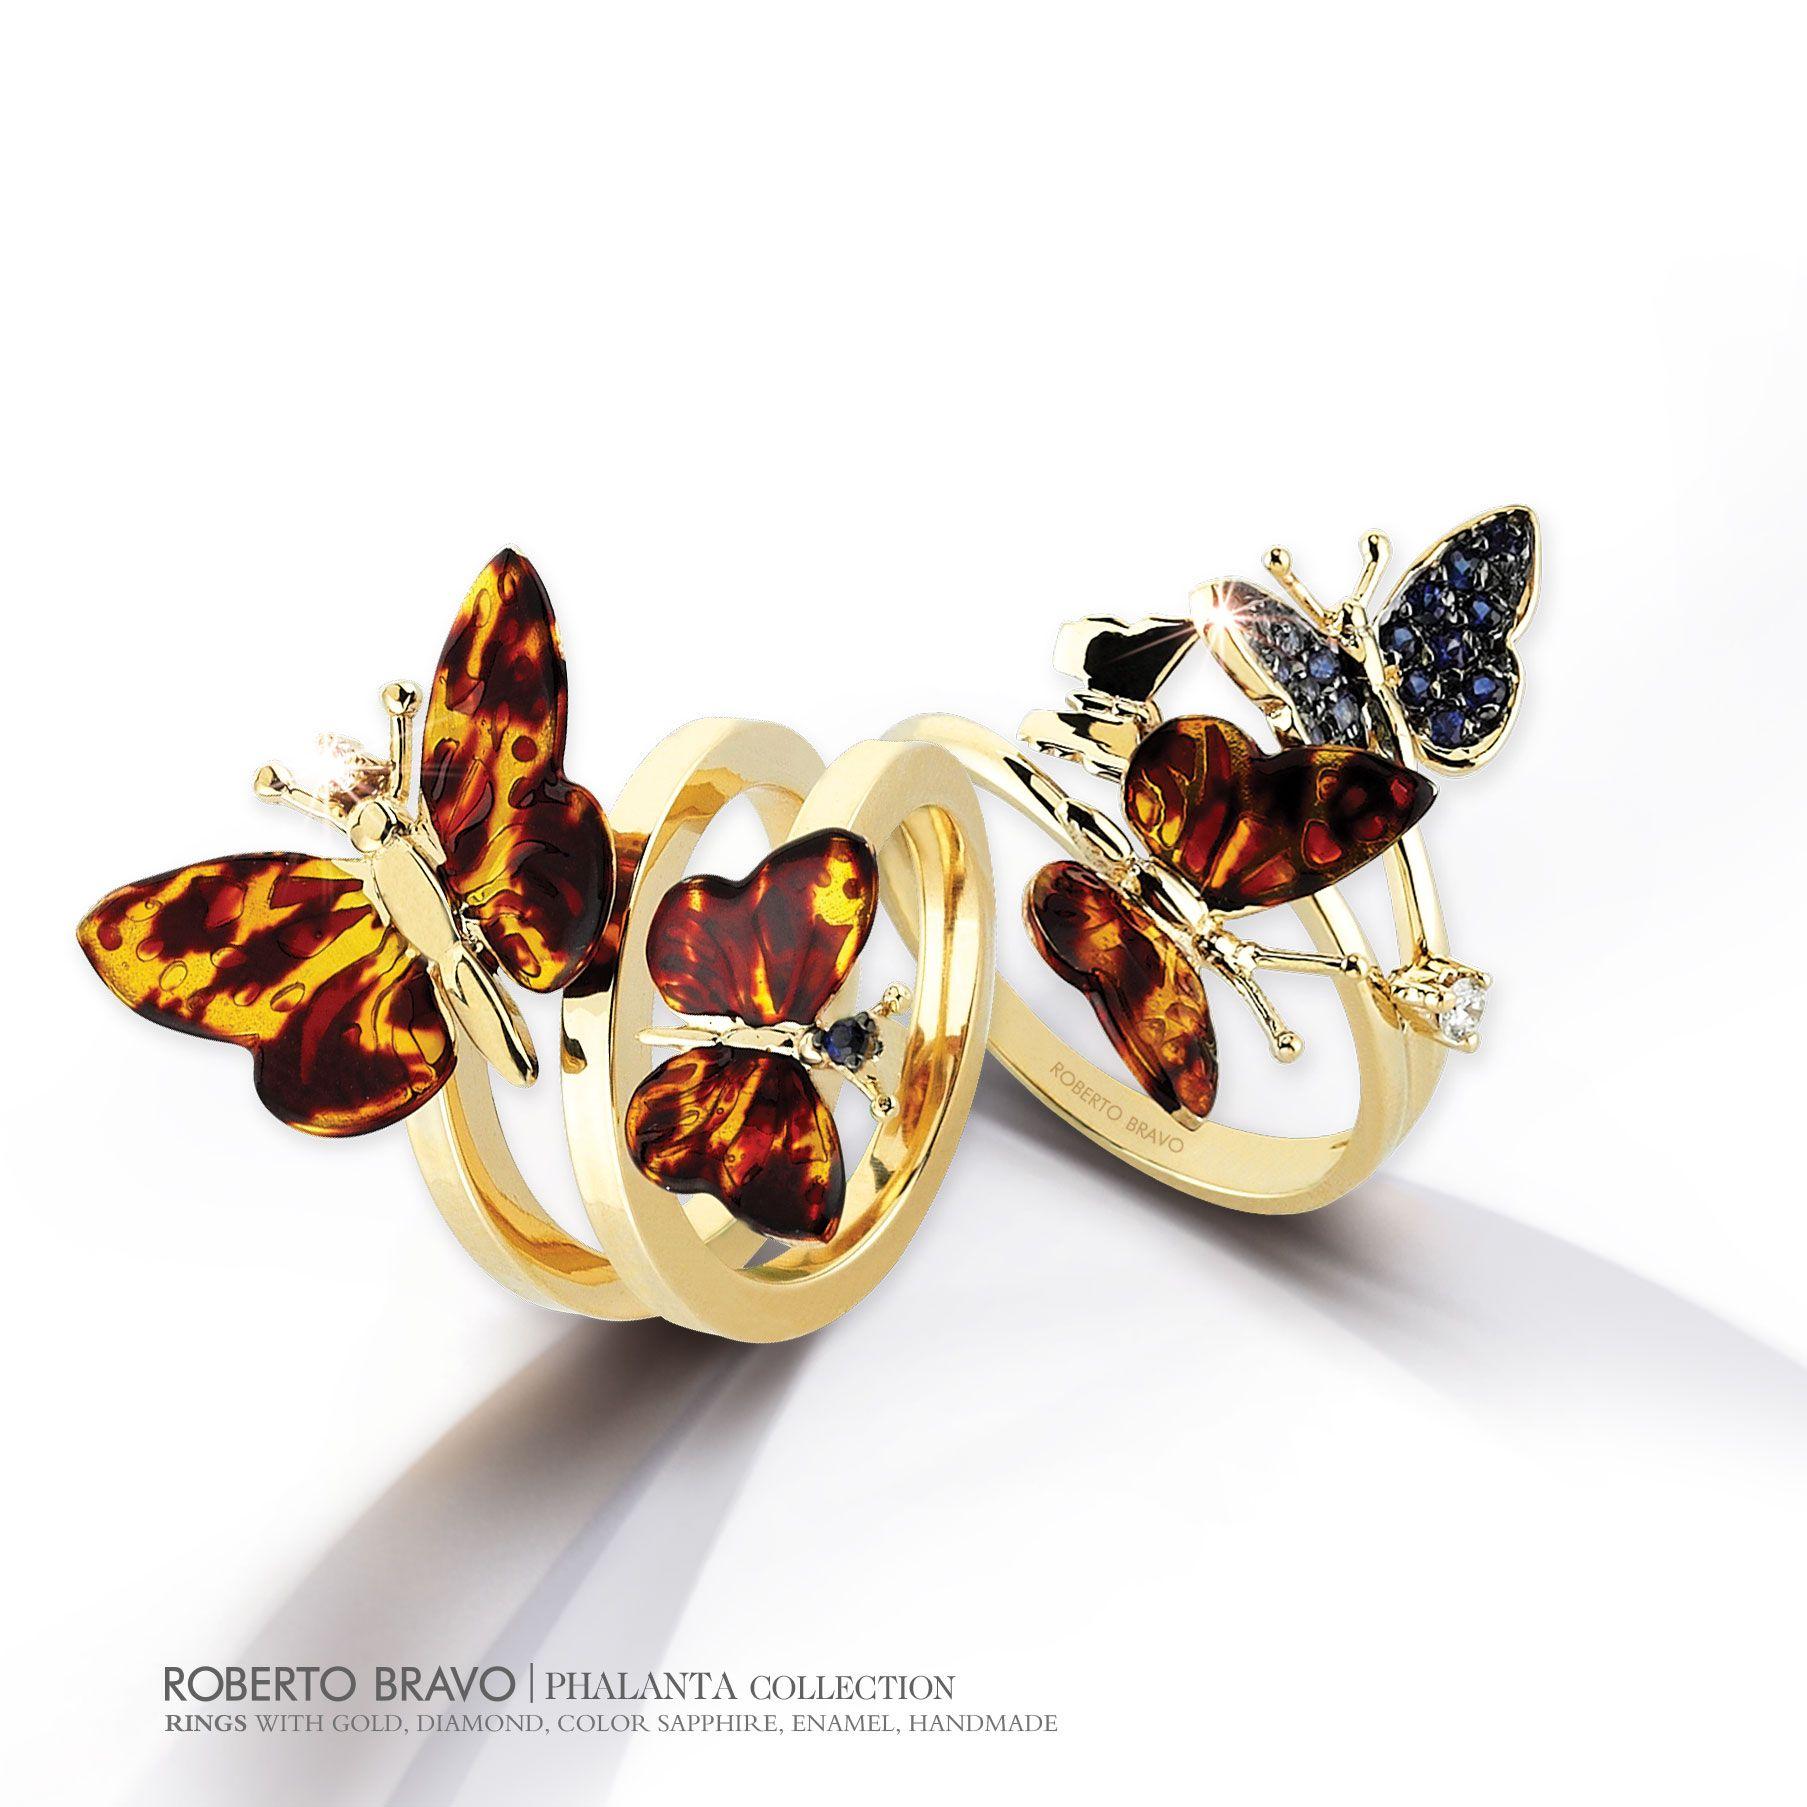 Here is the leopard with his unique figure.. Now beautifies the leafs of butterflies with his amazing lines. This is #Phalanta collection by #RobertoBravo.  #bravorobertobravo #inspiringjewellery #iloverb #diamonds #gold #handmade #nature #inspiringday #art #extraordinary #jewellery #ювелир #золото #алмаз #бриллианты #ручнойработы #экстраординарный #loveisblue #enamel #firedenamel #artbyrobertobravo #artbyrb